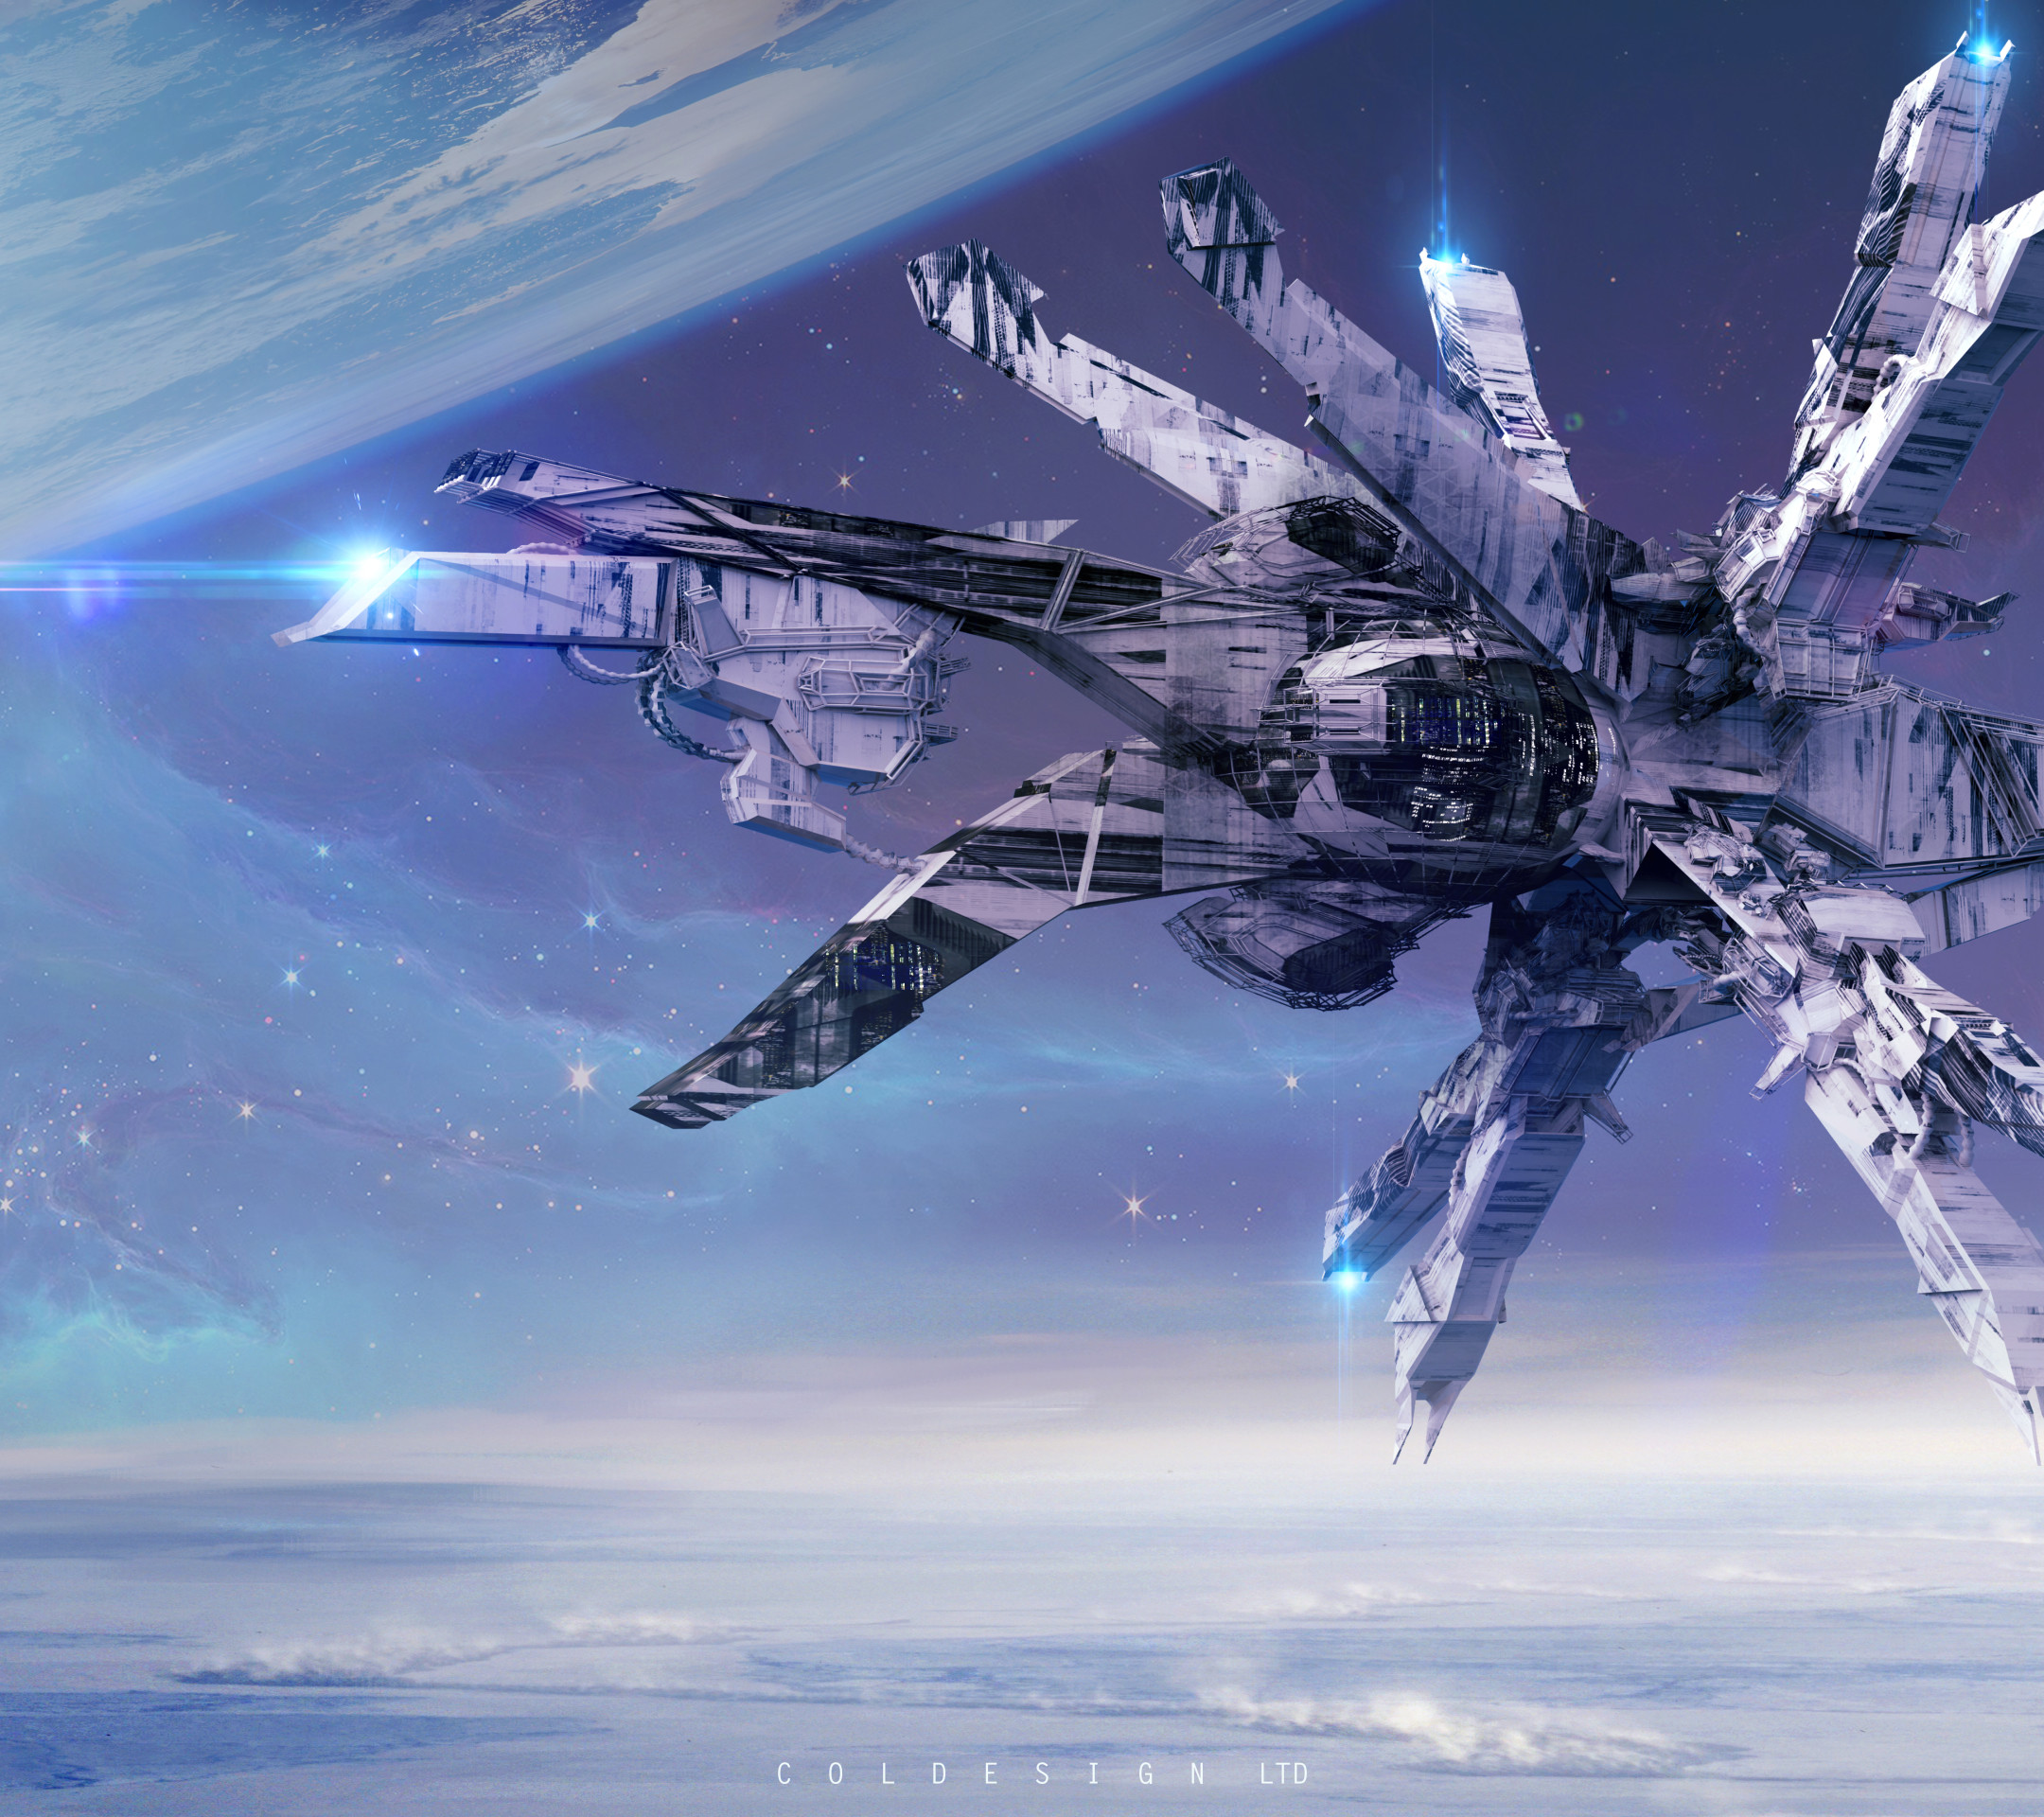 Sci Fi Spaceship Wallpaper (81+ images)